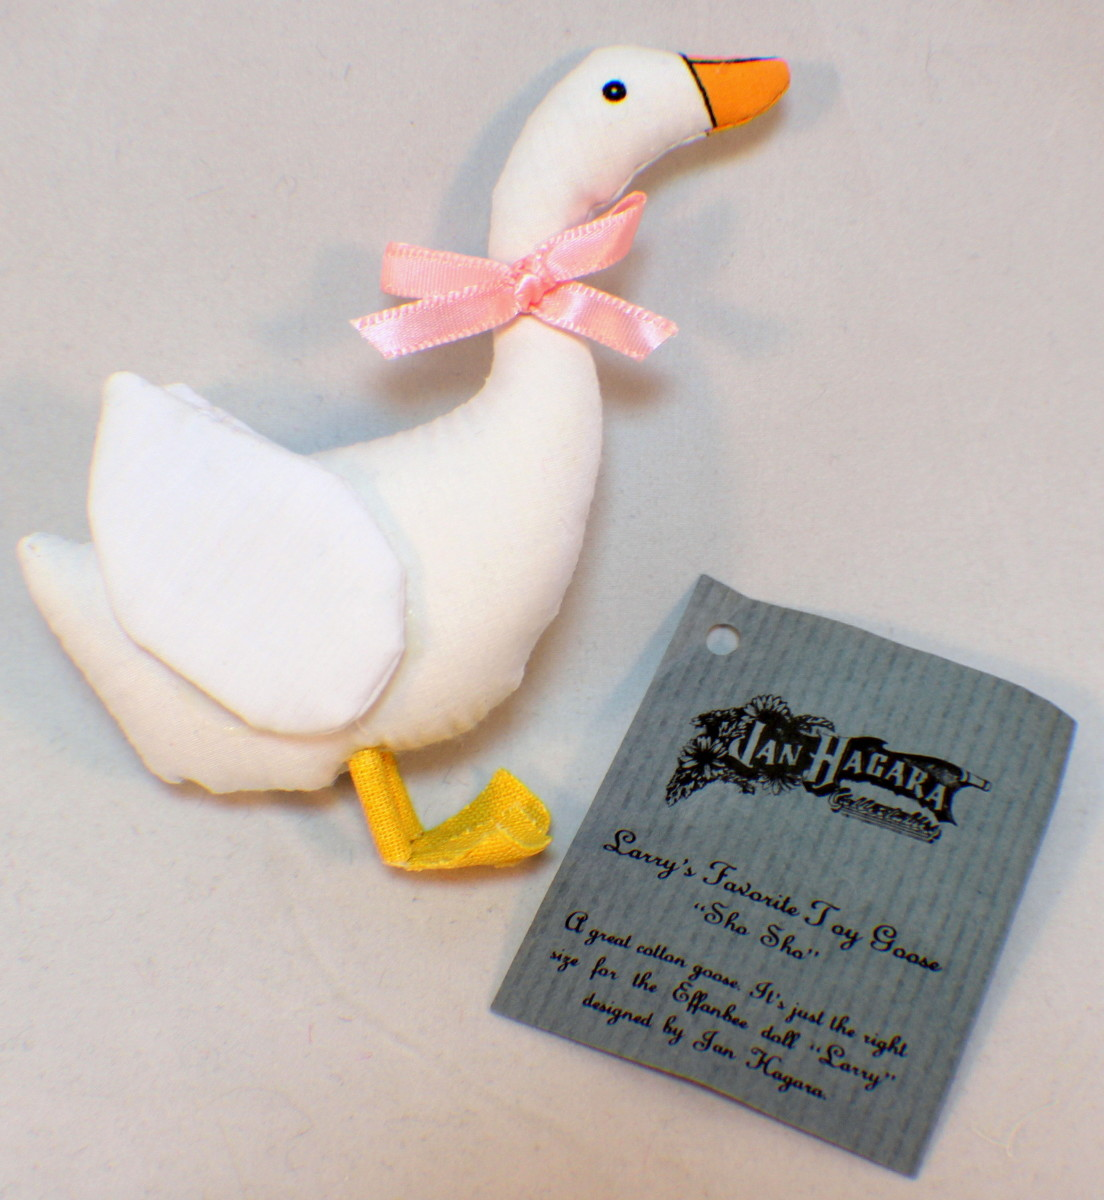 Jan Hagara Lithograph: Vintage Jan Hagara Minty Crisp Larry Doll's Toy Goose Duck